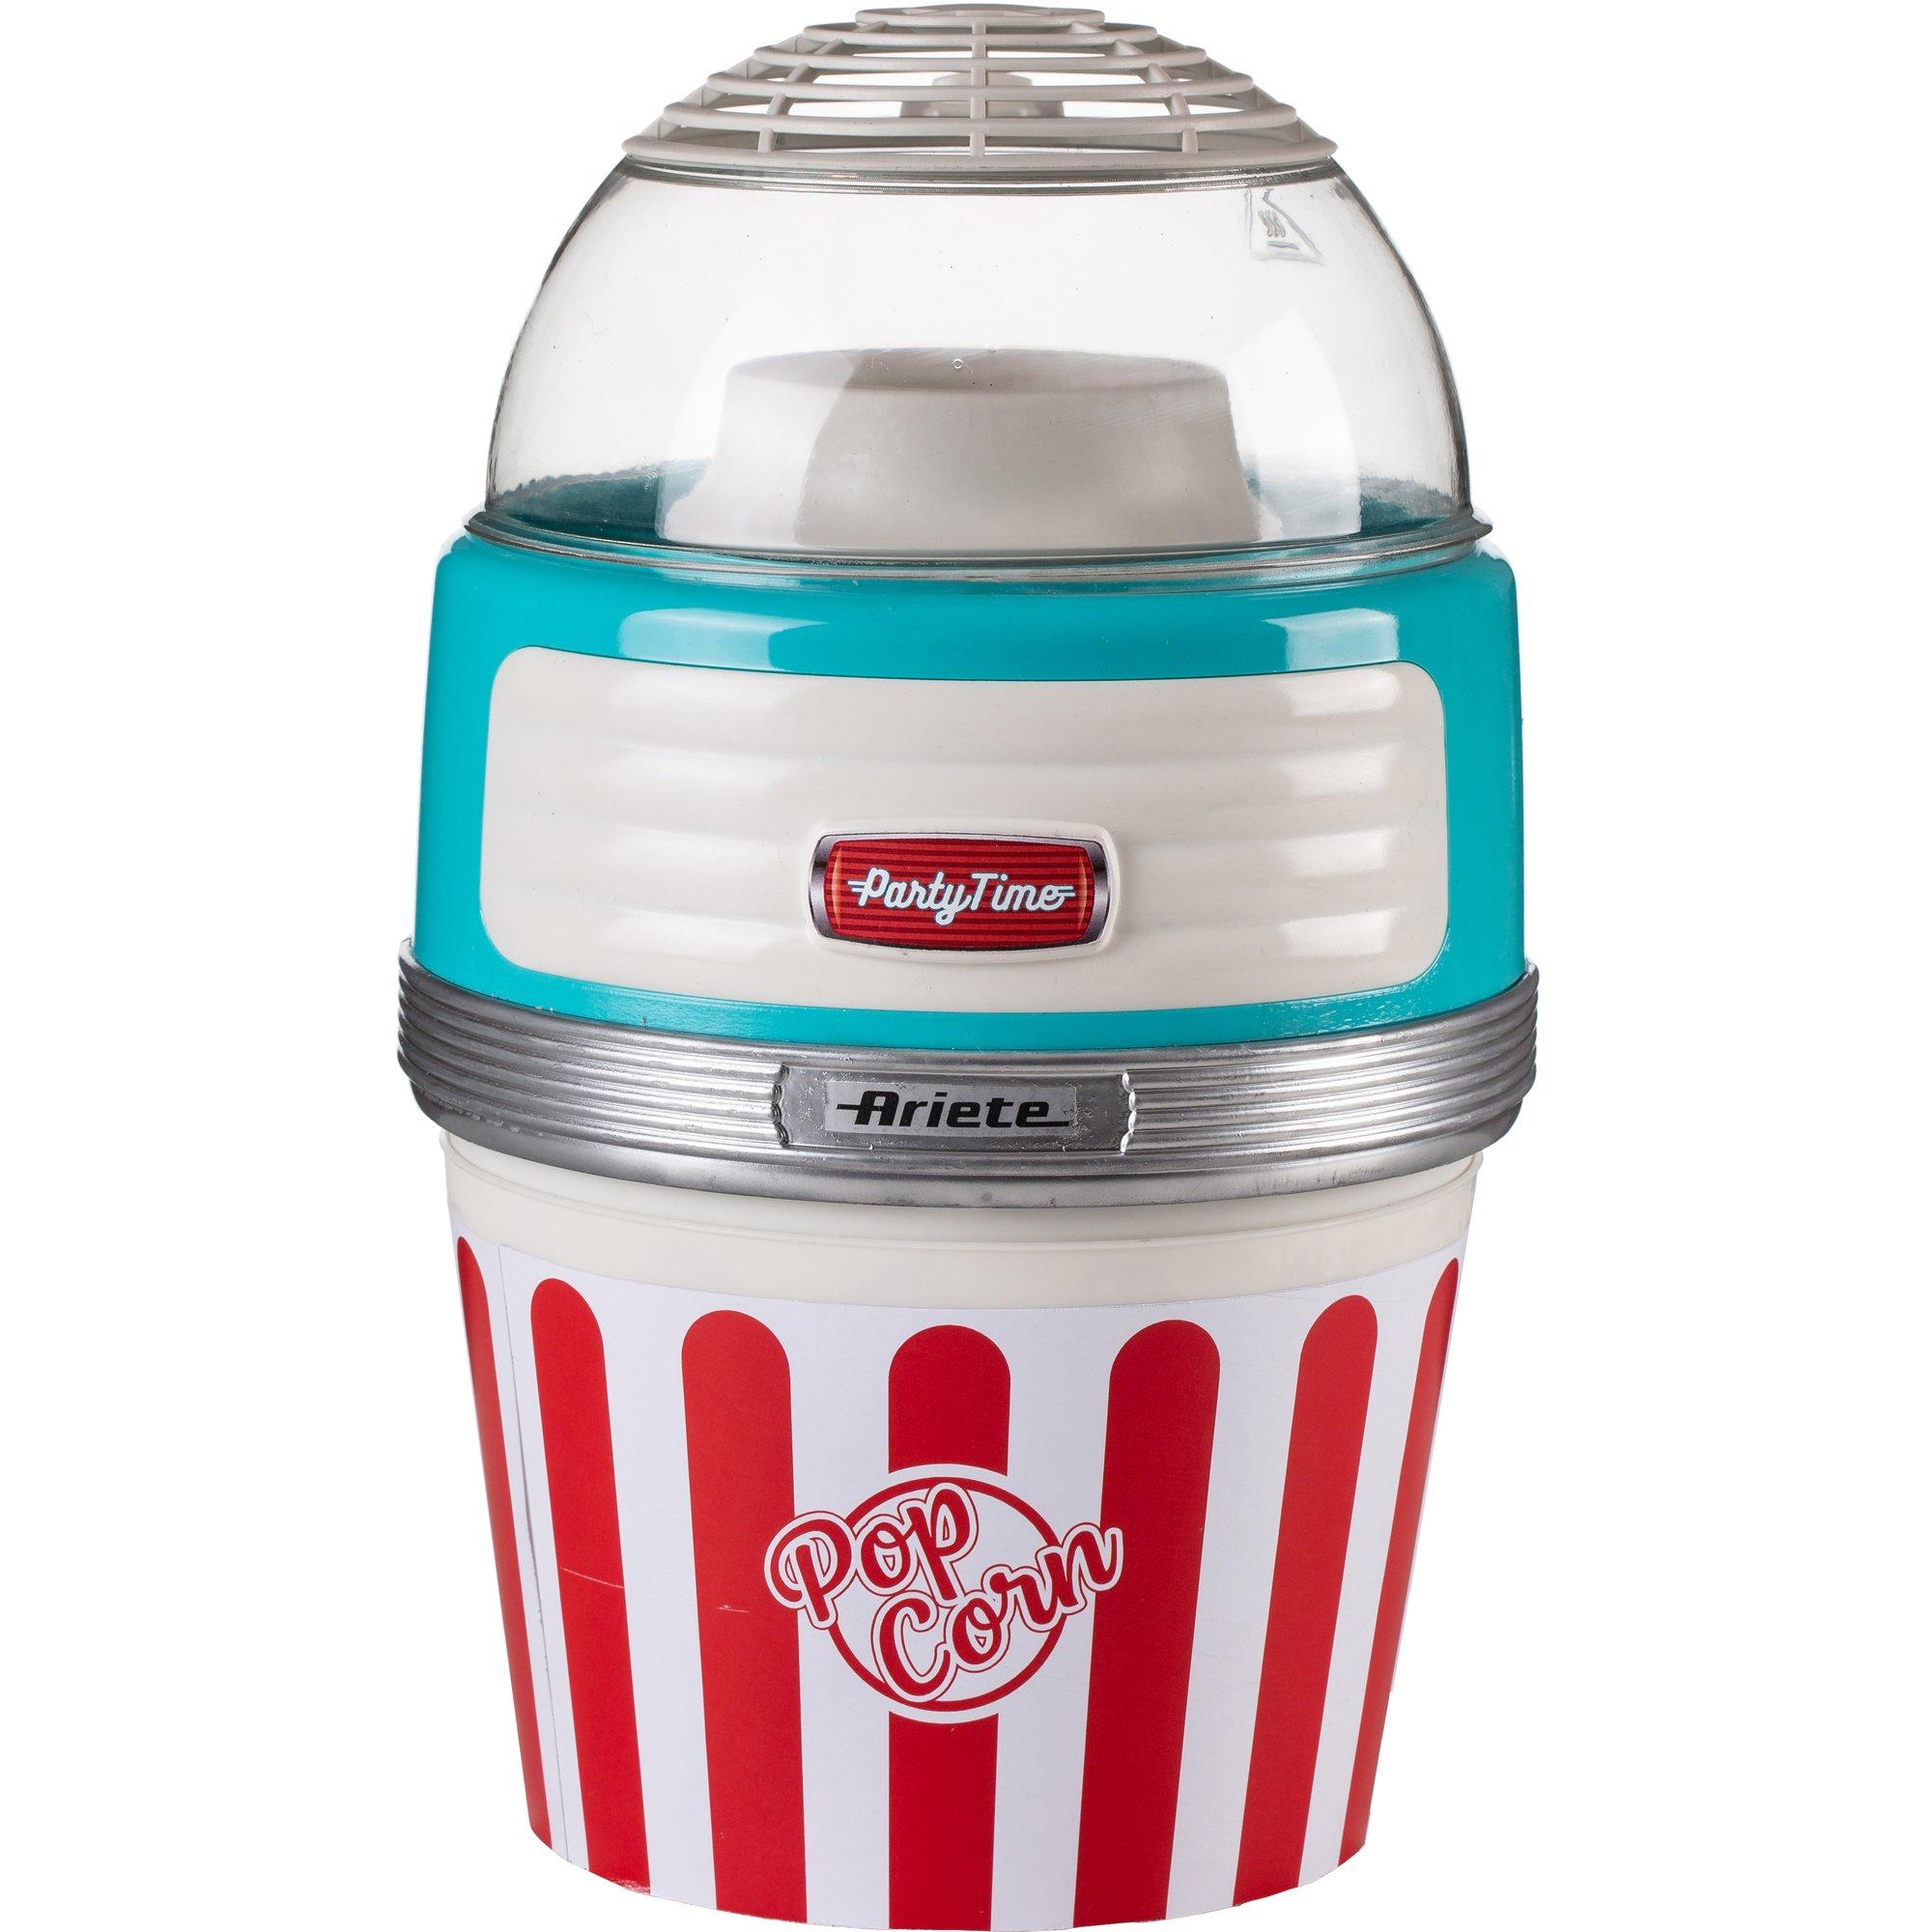 Ariete Party Time Popcornmaskin XL blå